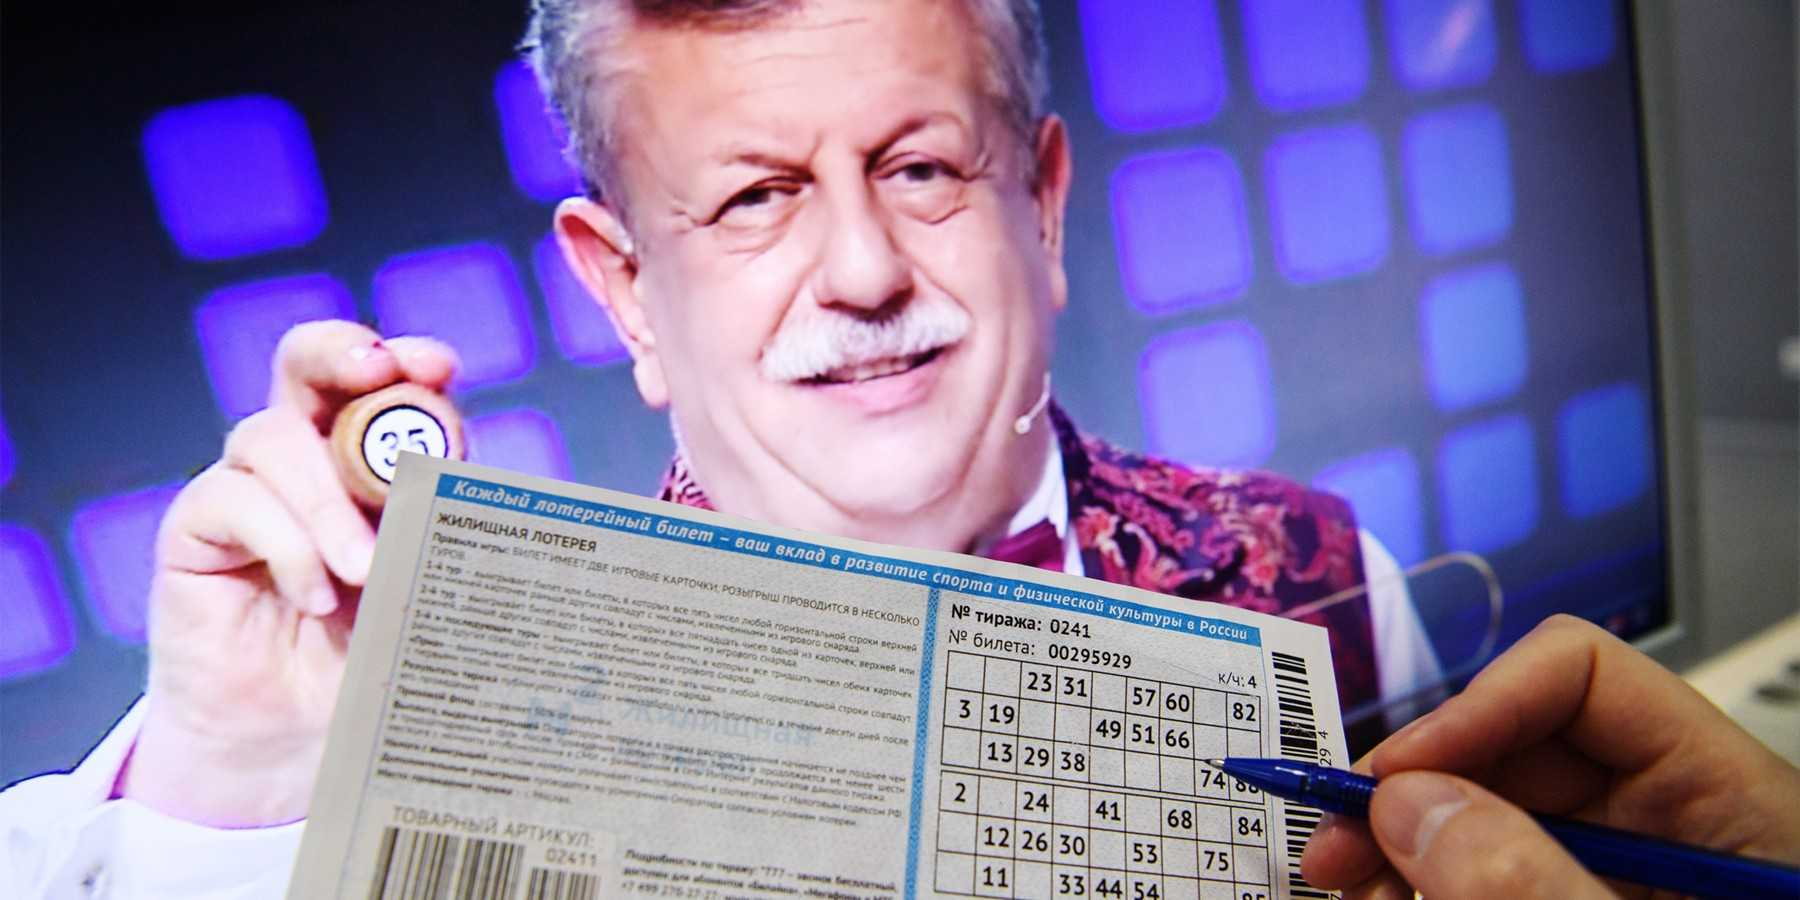 Hvorfor Stoloto ikke vises live. svindel av Russland online og offline. statlig lotterisvindel gullnøkkel, Russisk loto og andre. Russisk loto-svindel, state lotto svindel. hele sannheten om statslotterier, Russisk lotto, orglot